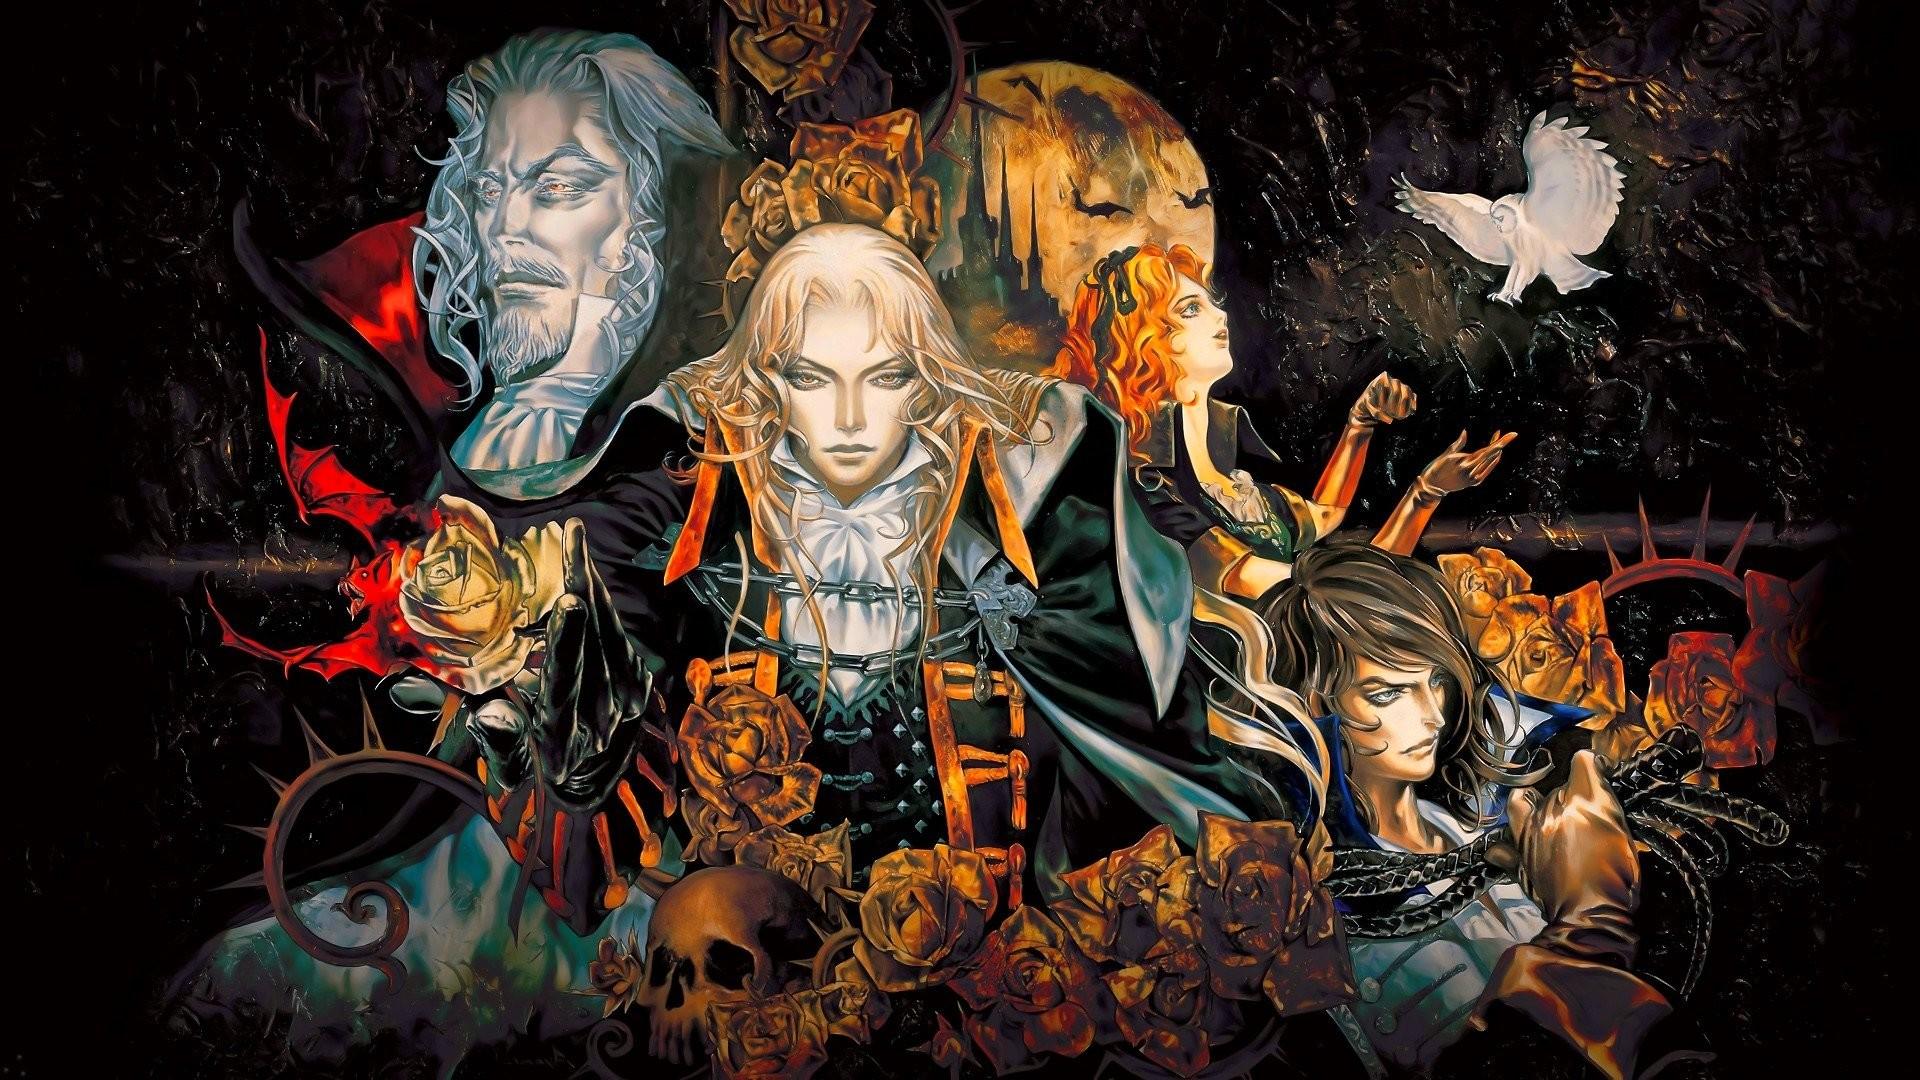 Res: 1920x1080, castlevania, Fantasy, Dark, Vampire, Horror, Evil, Warrior, Gothic  Wallpapers HD / Desktop and Mobile Backgrounds